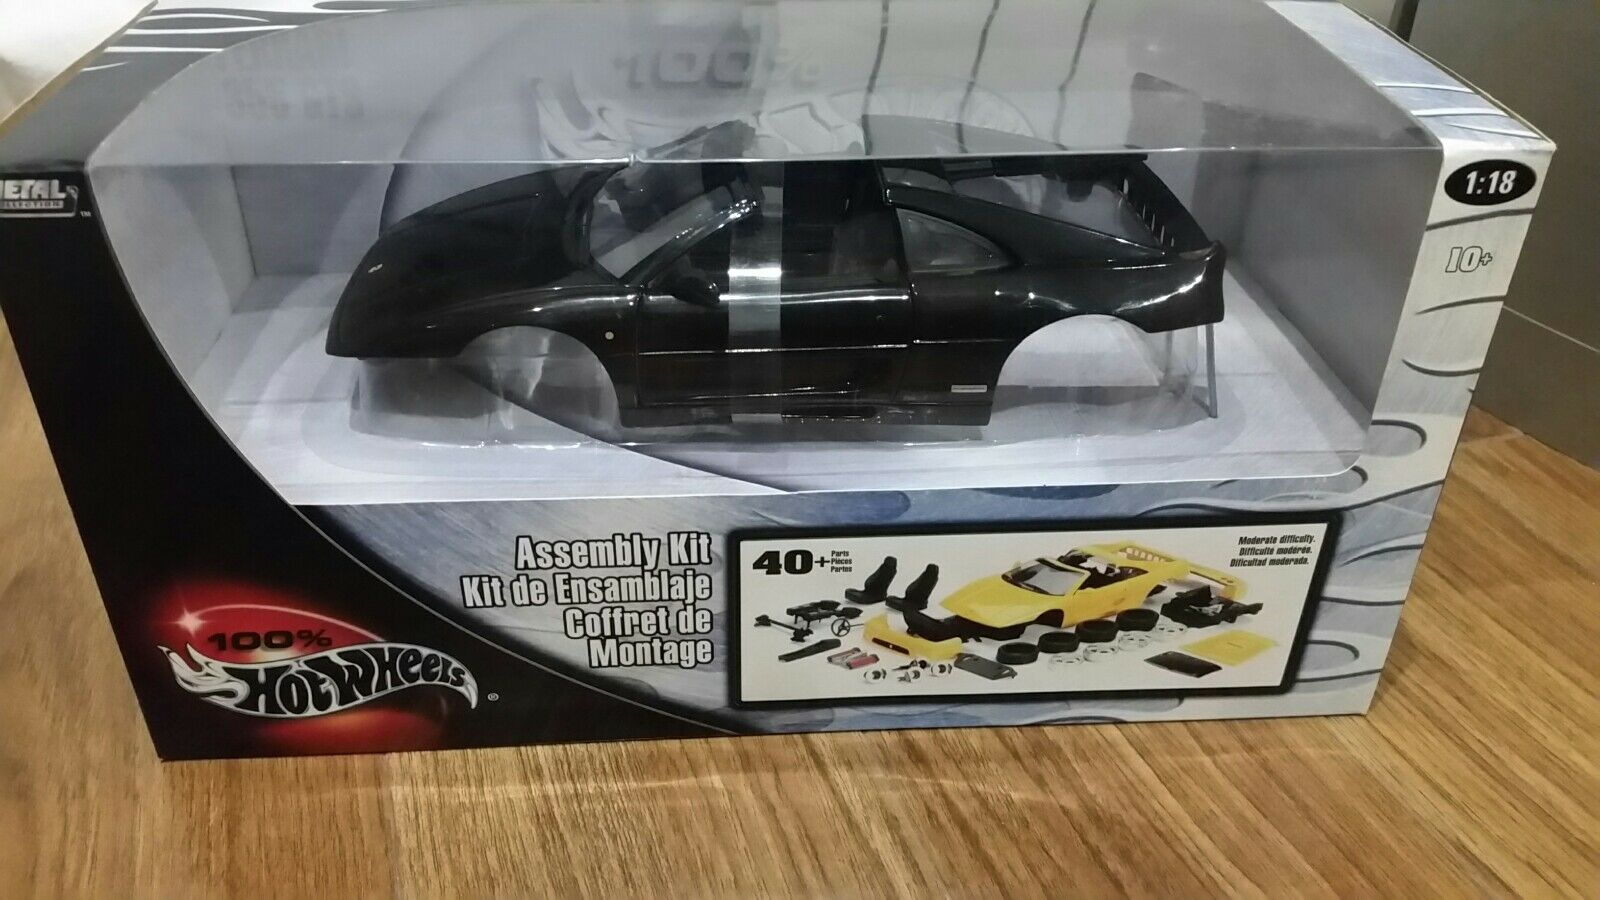 ahorra hasta un 50% 1 18 Ferrari f355 355 gts kit kit kit de ensamblaje hotwheels  salida de fábrica